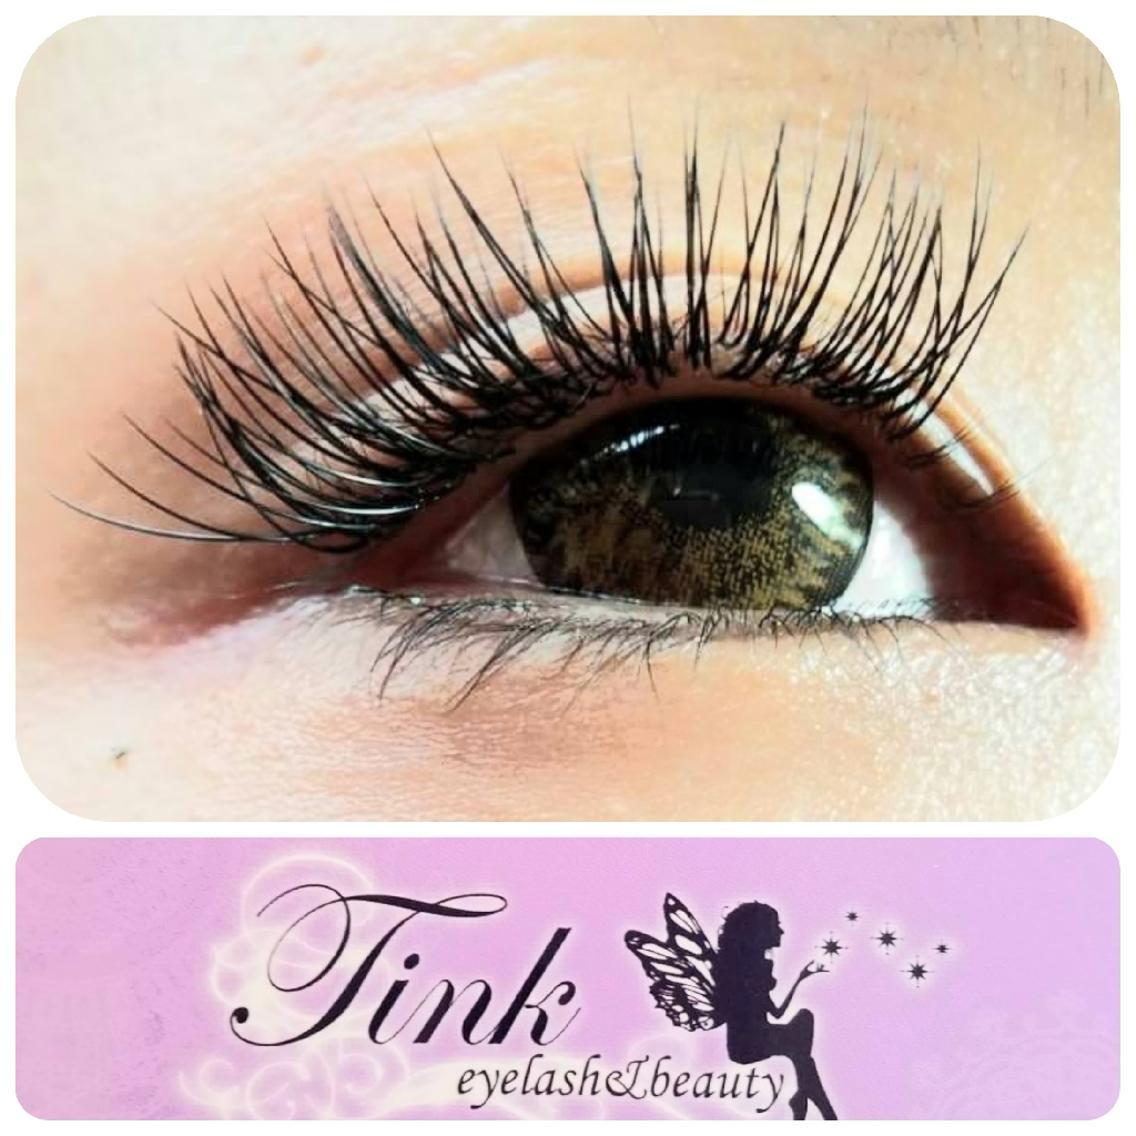 TINK eyelash&beauty所属・TINKティンクの掲載